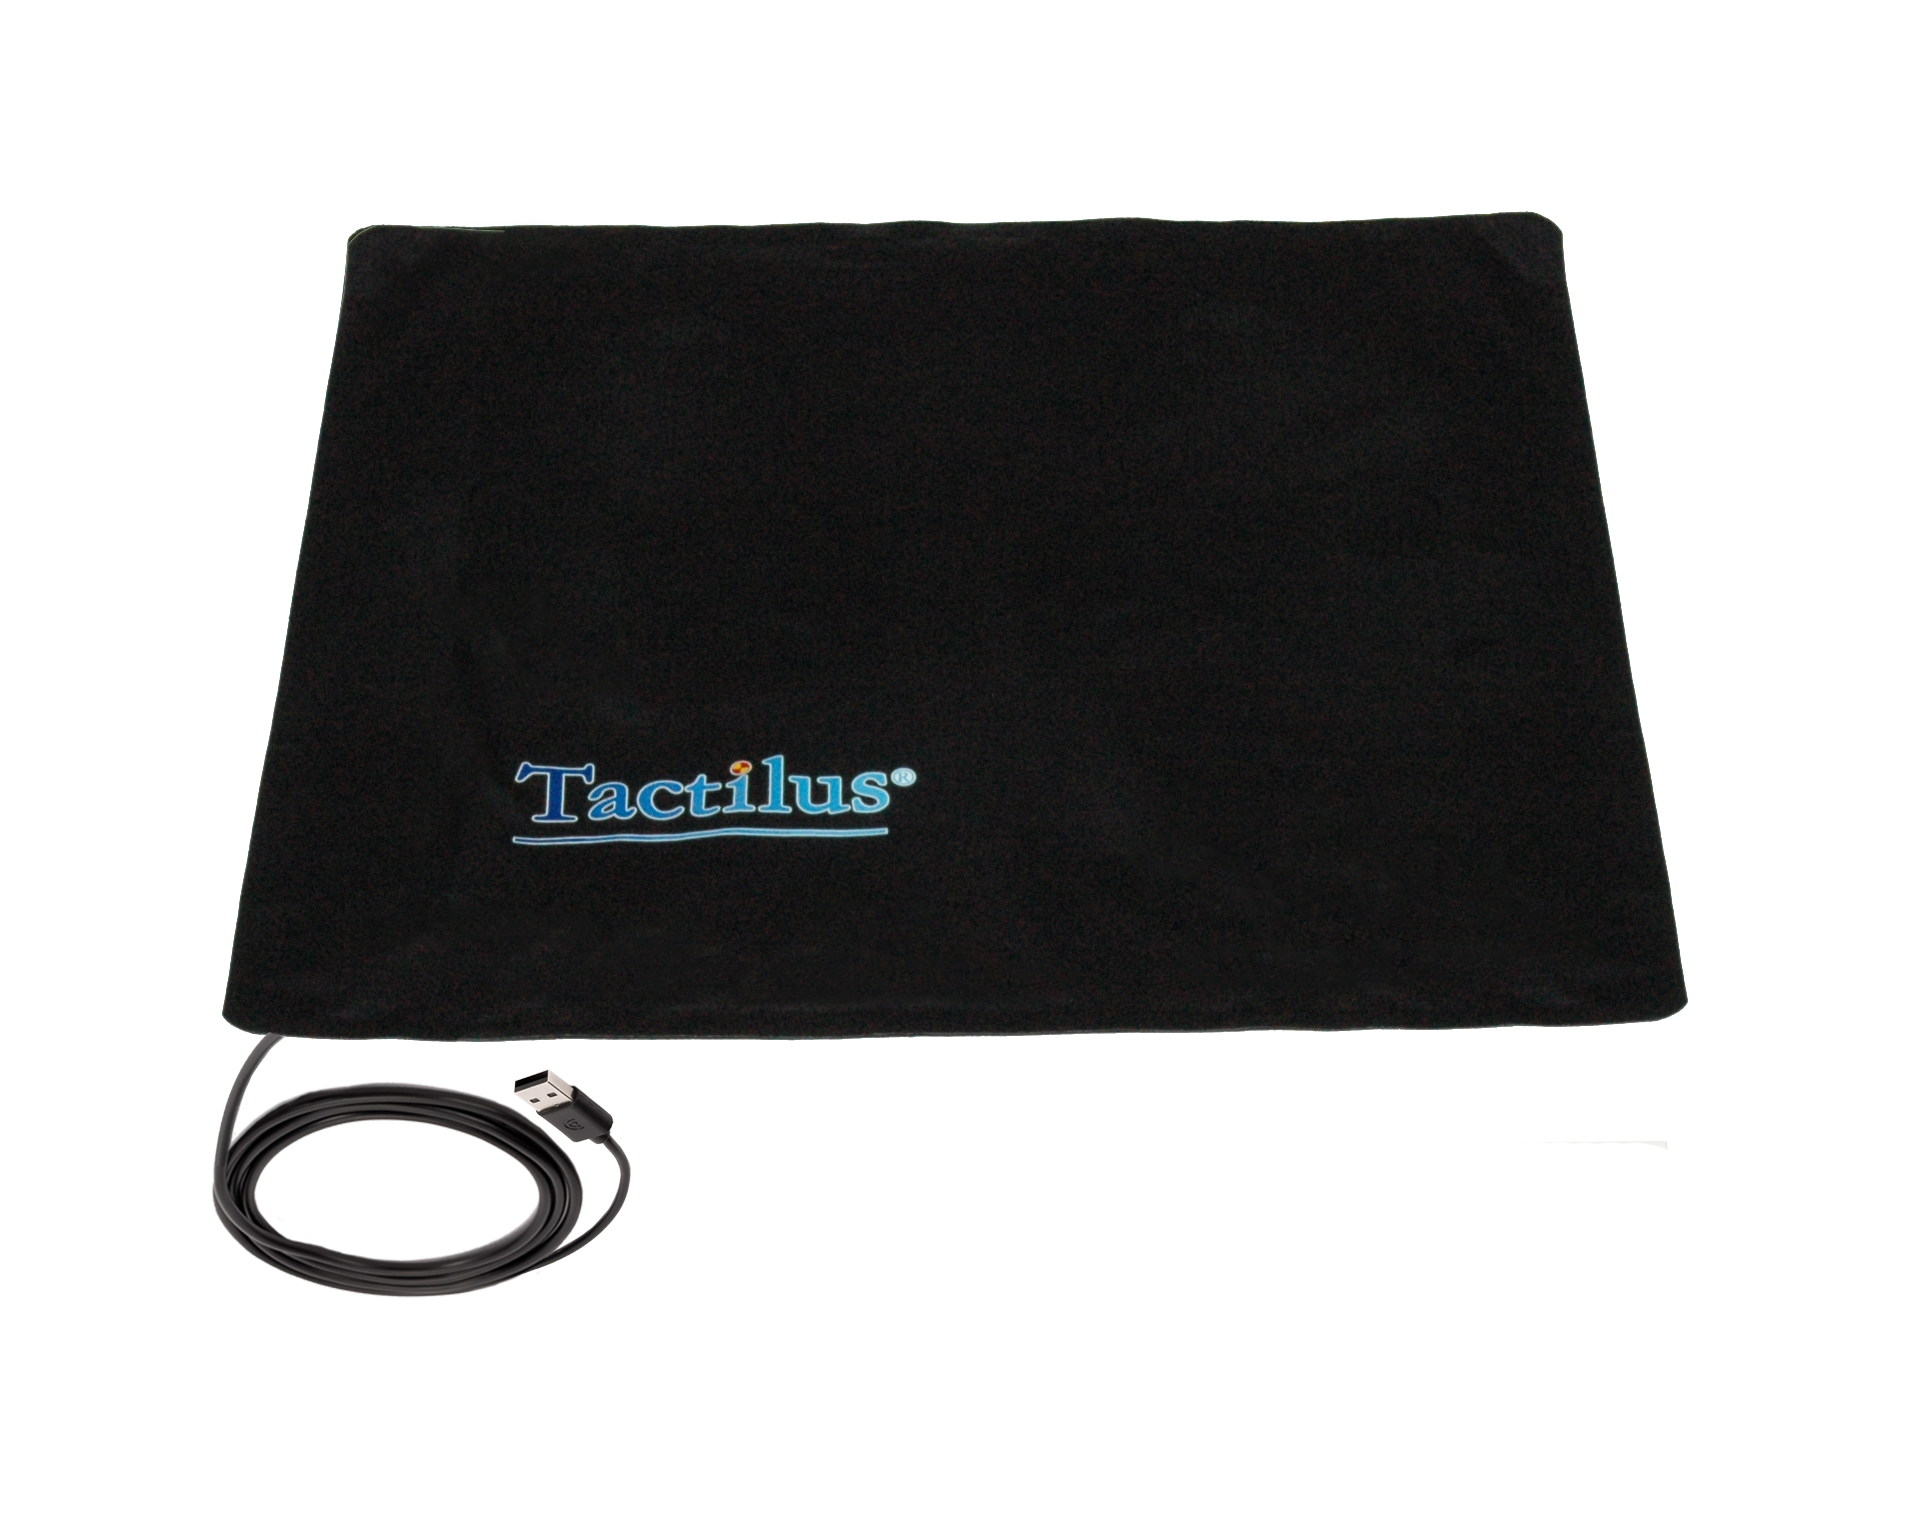 Tactilus Bodyfitter Seat Sensor Seat Design And Testing